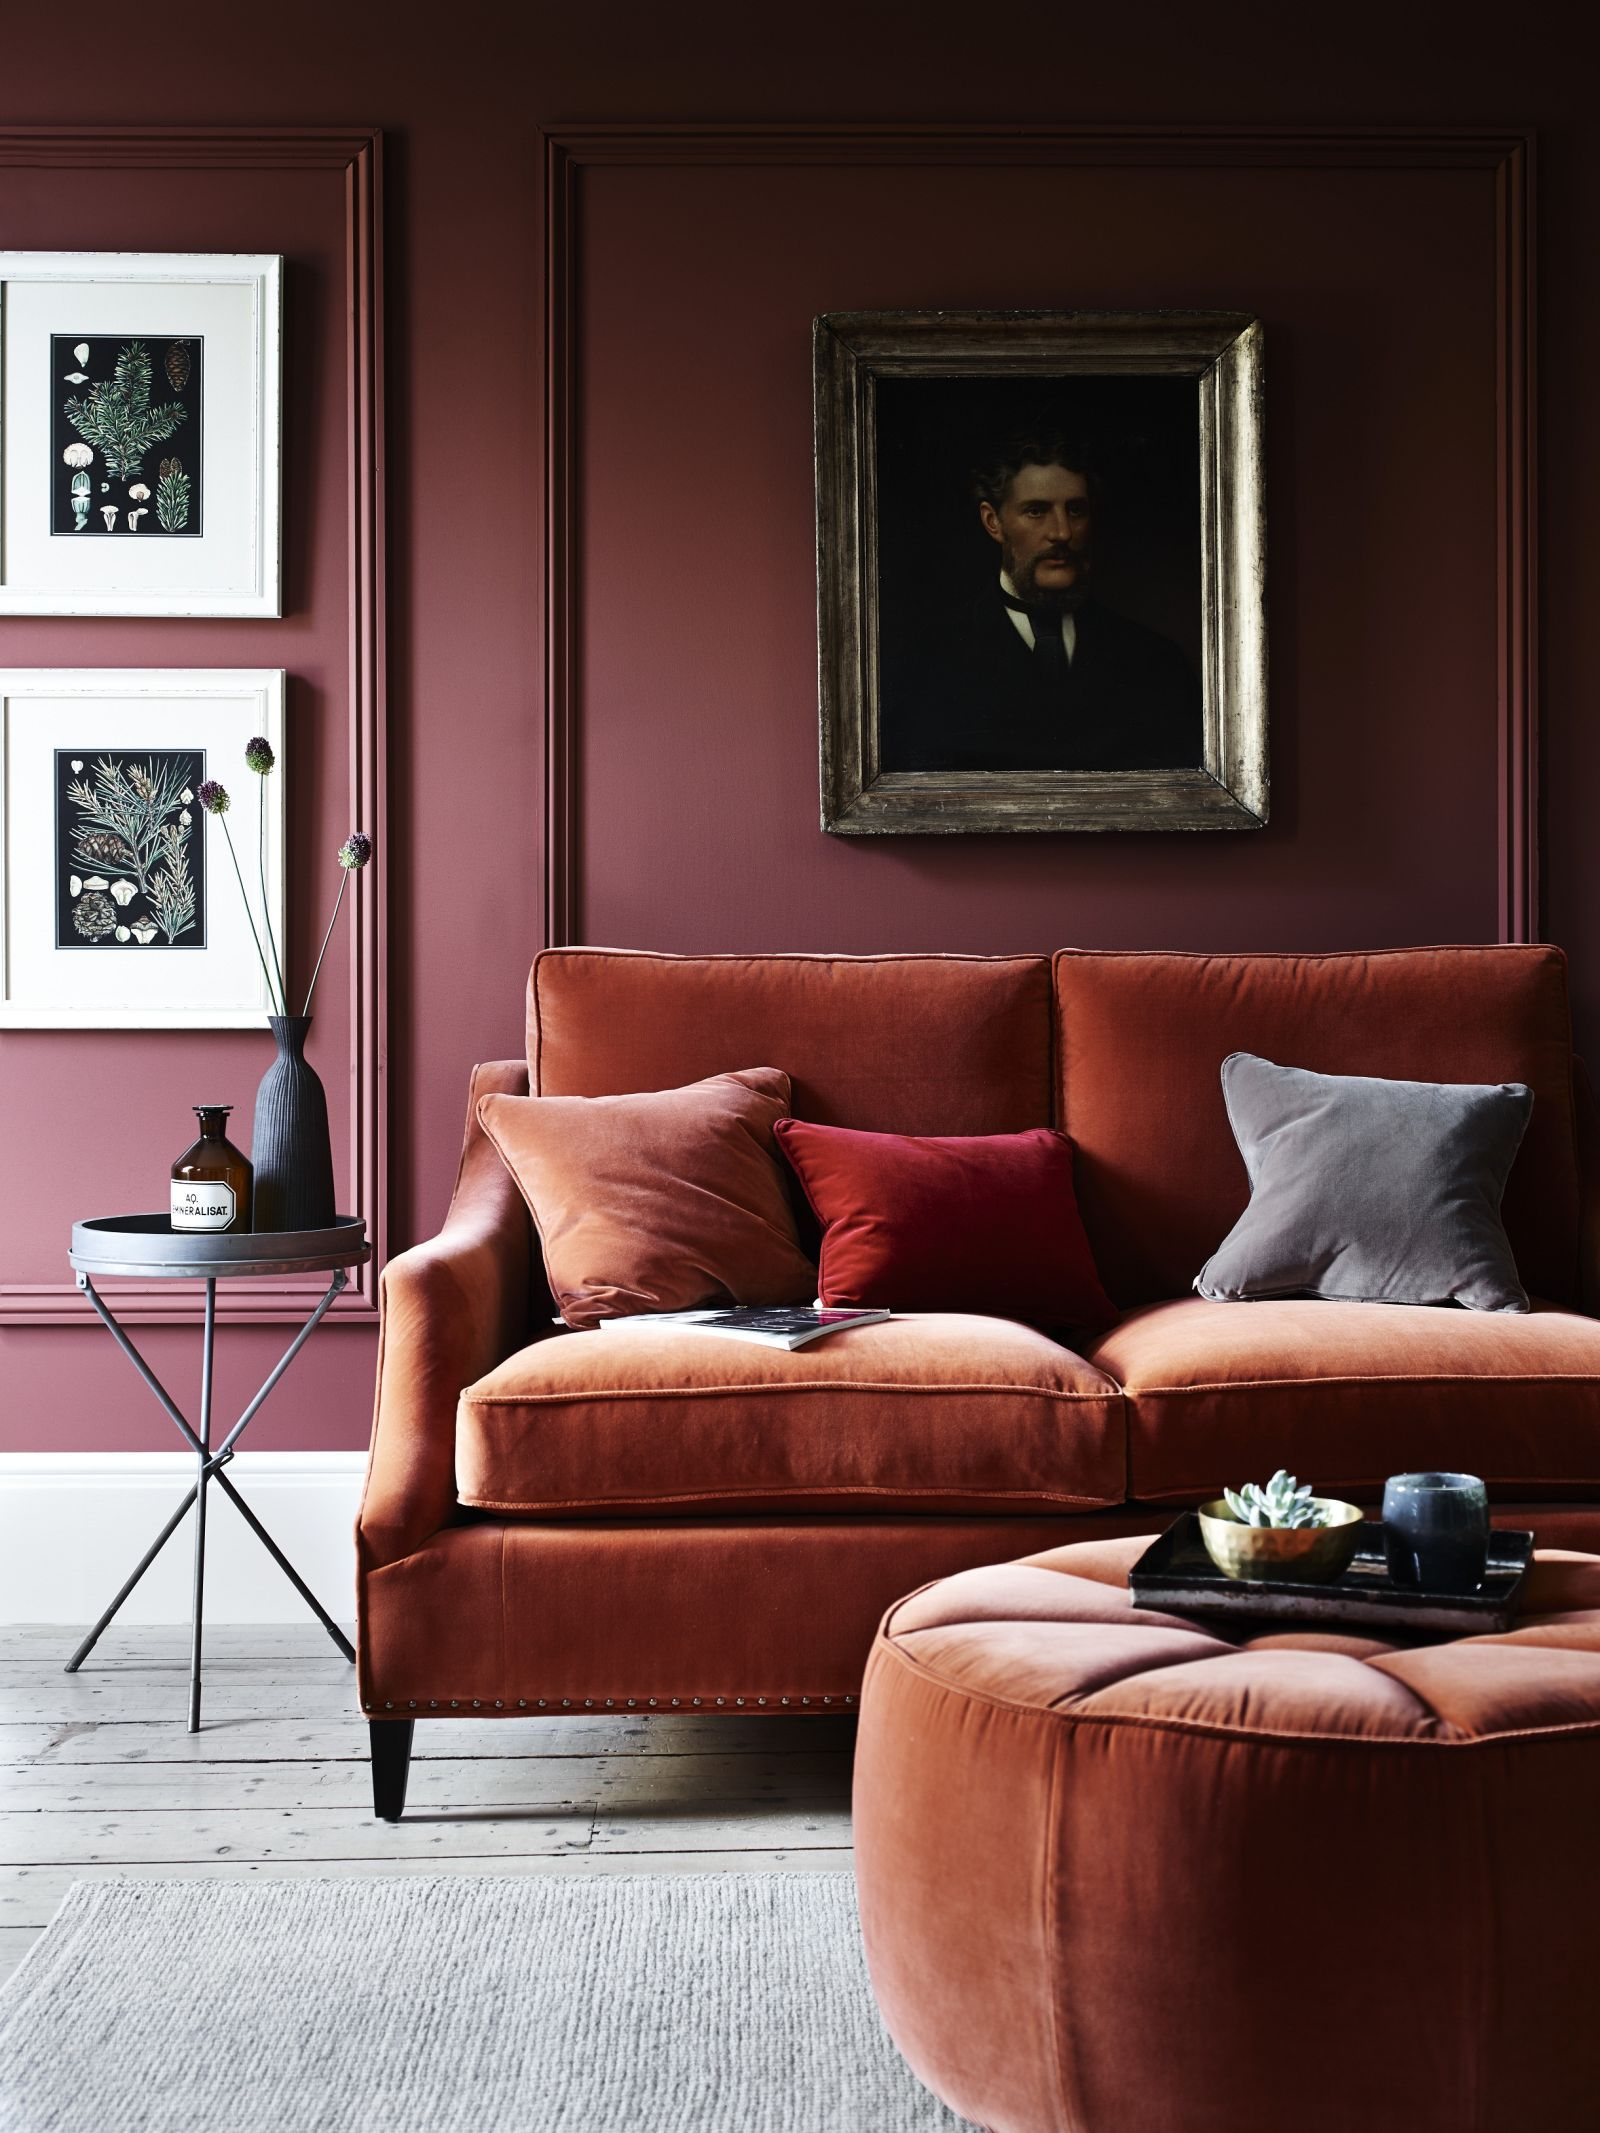 40 best burgundy decor images on Pinterest | Burgundy ...